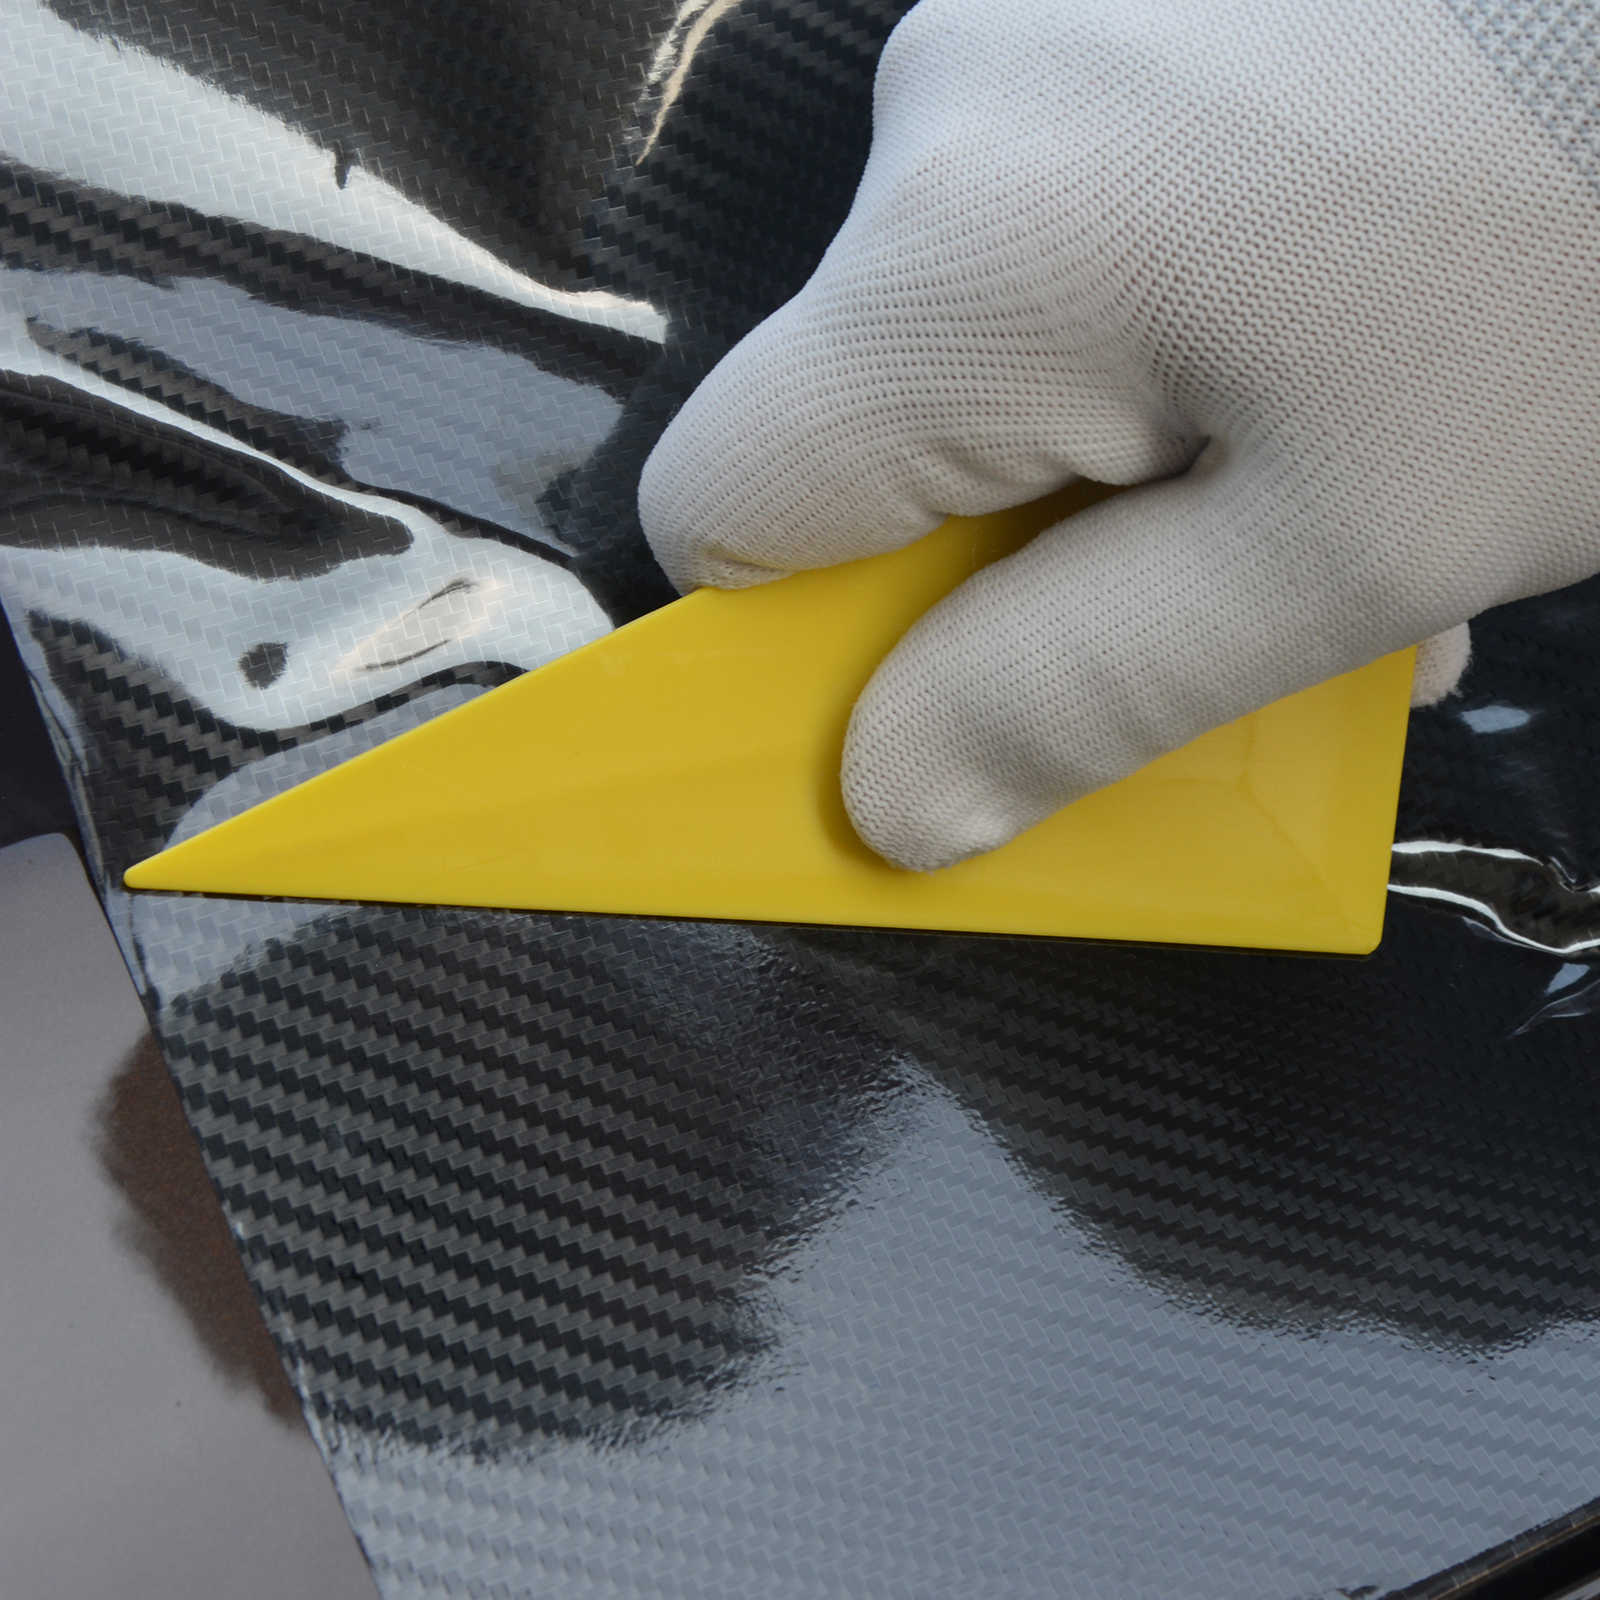 Foshio Car Wrapping Magnetische Zuigmond Gereedschap Kit Auto Sticker Styling Tool Vinyl Wrap Folie Film Cutter Window Tinting Tool Set